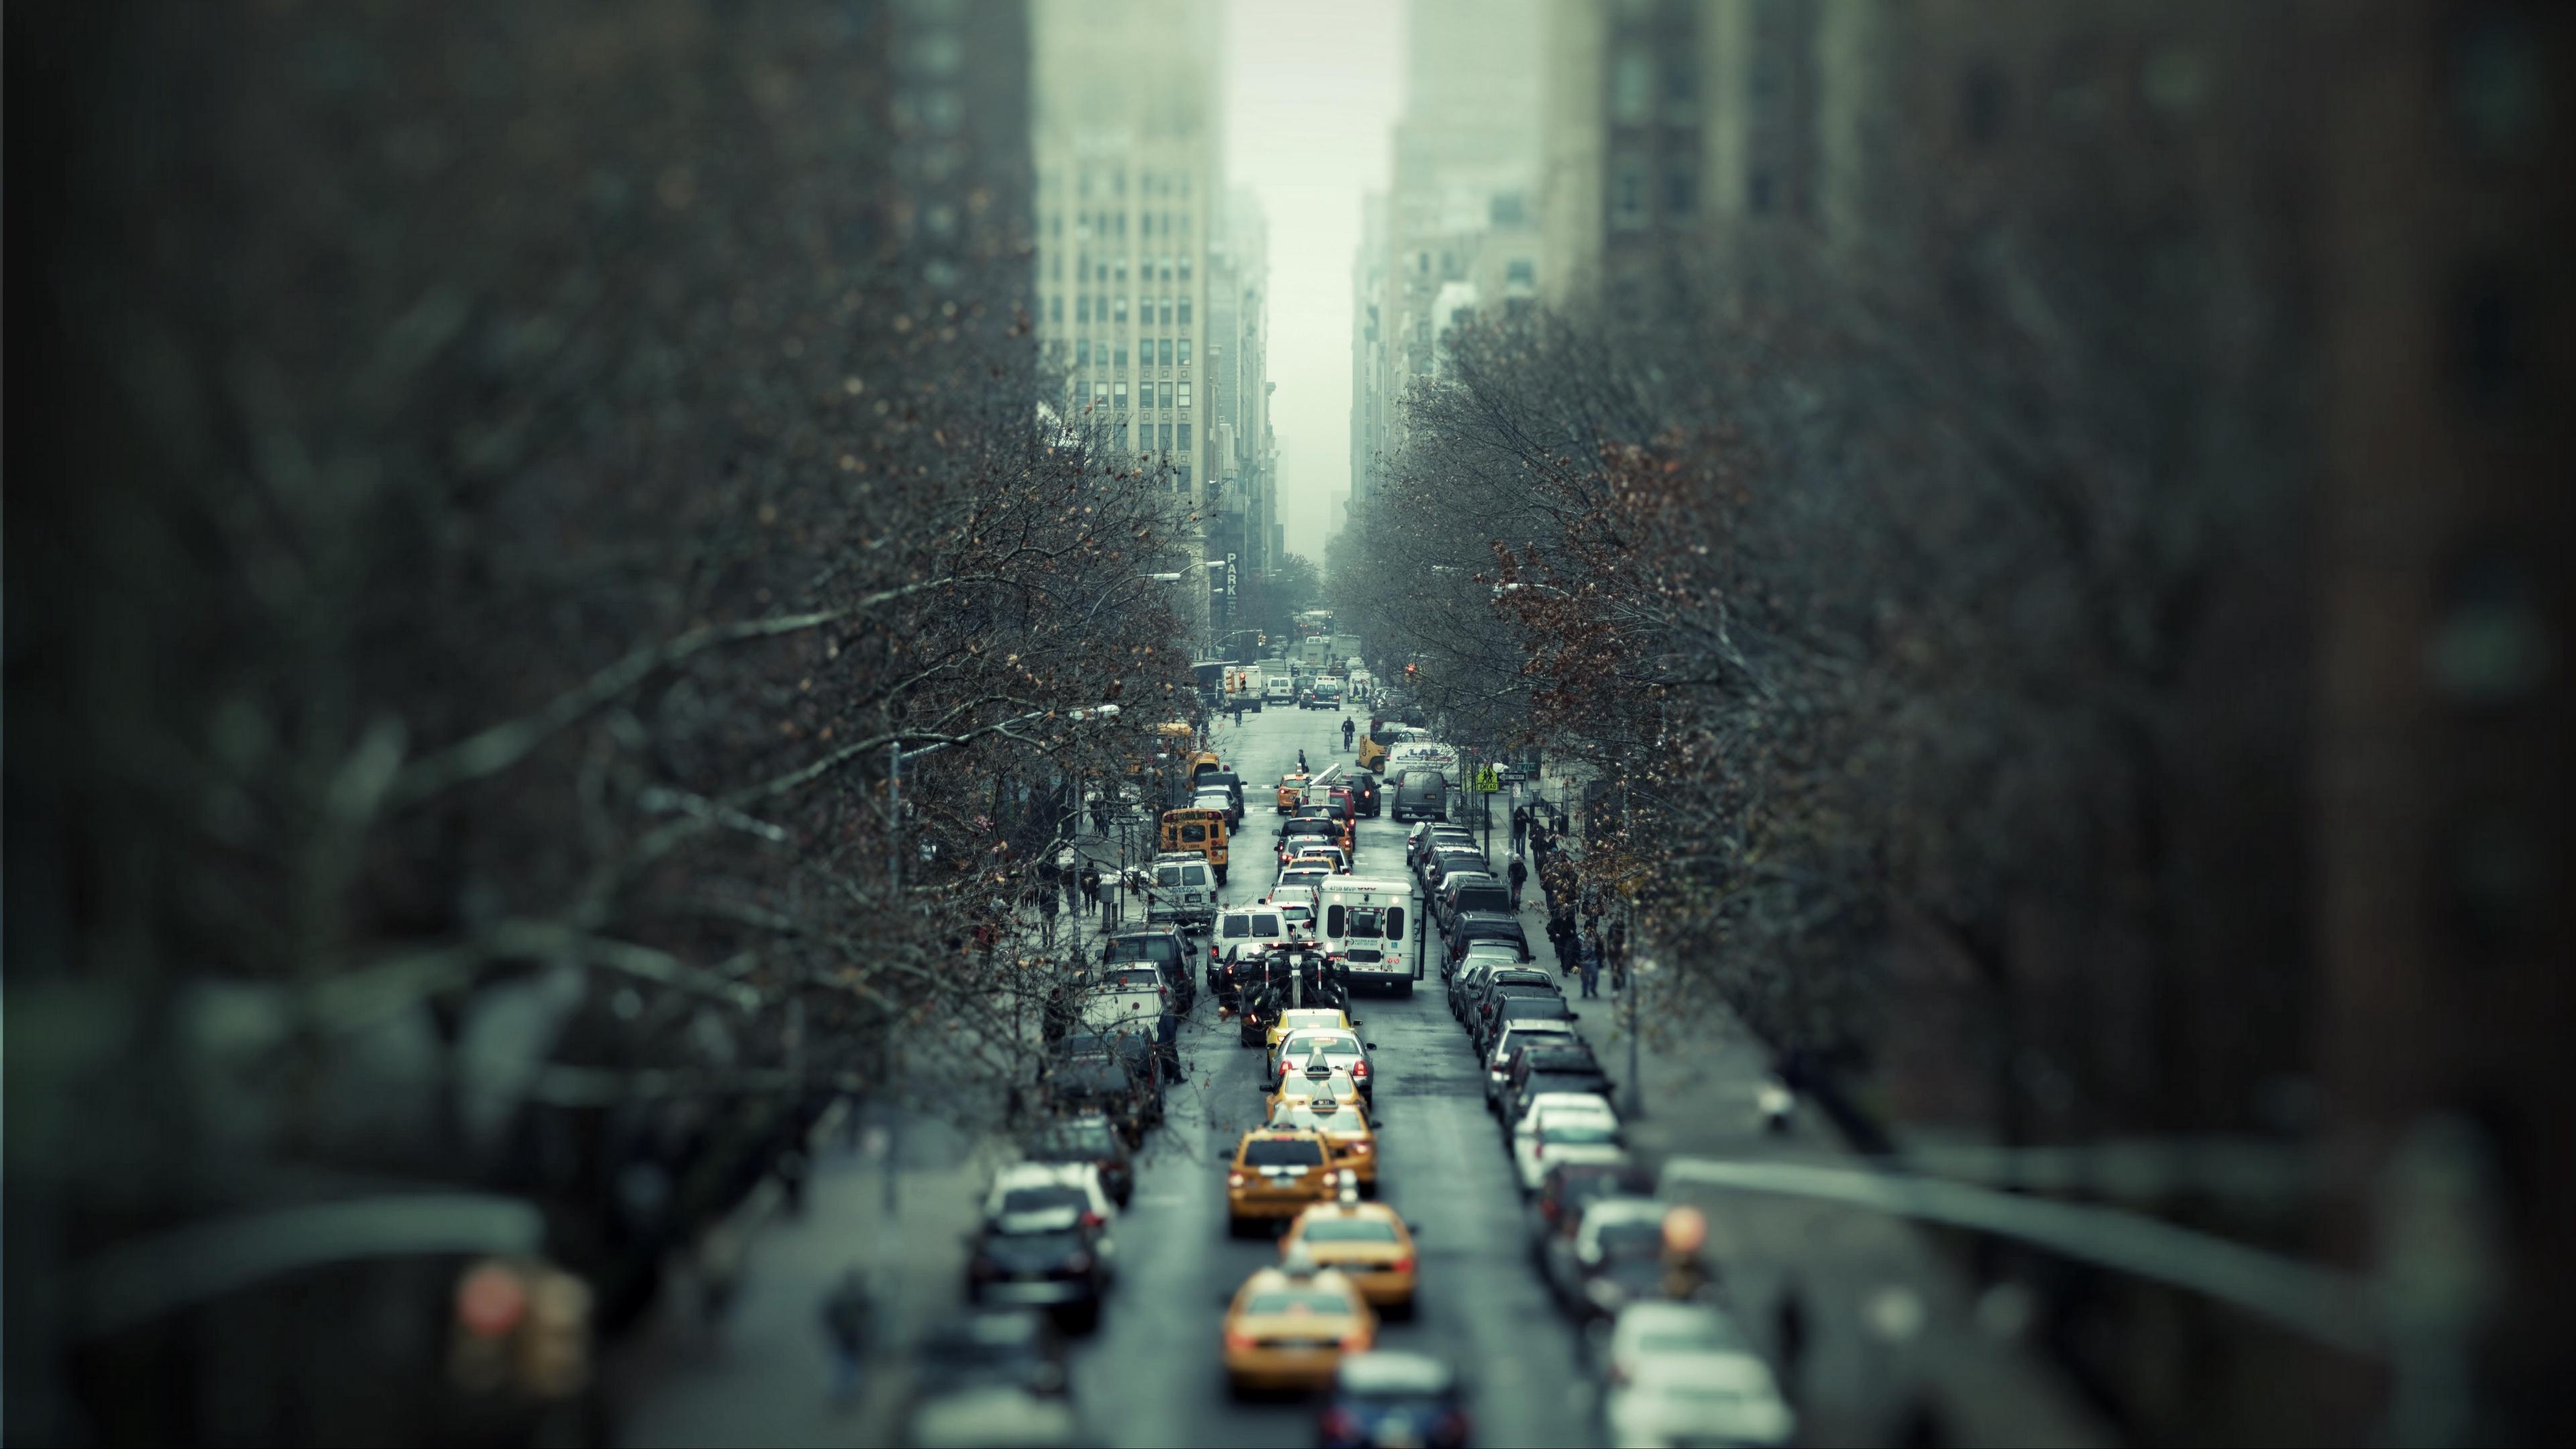 traffic road cars city 4k 1538066845 - traffic, road, cars, city 4k - Traffic, Road, Cars